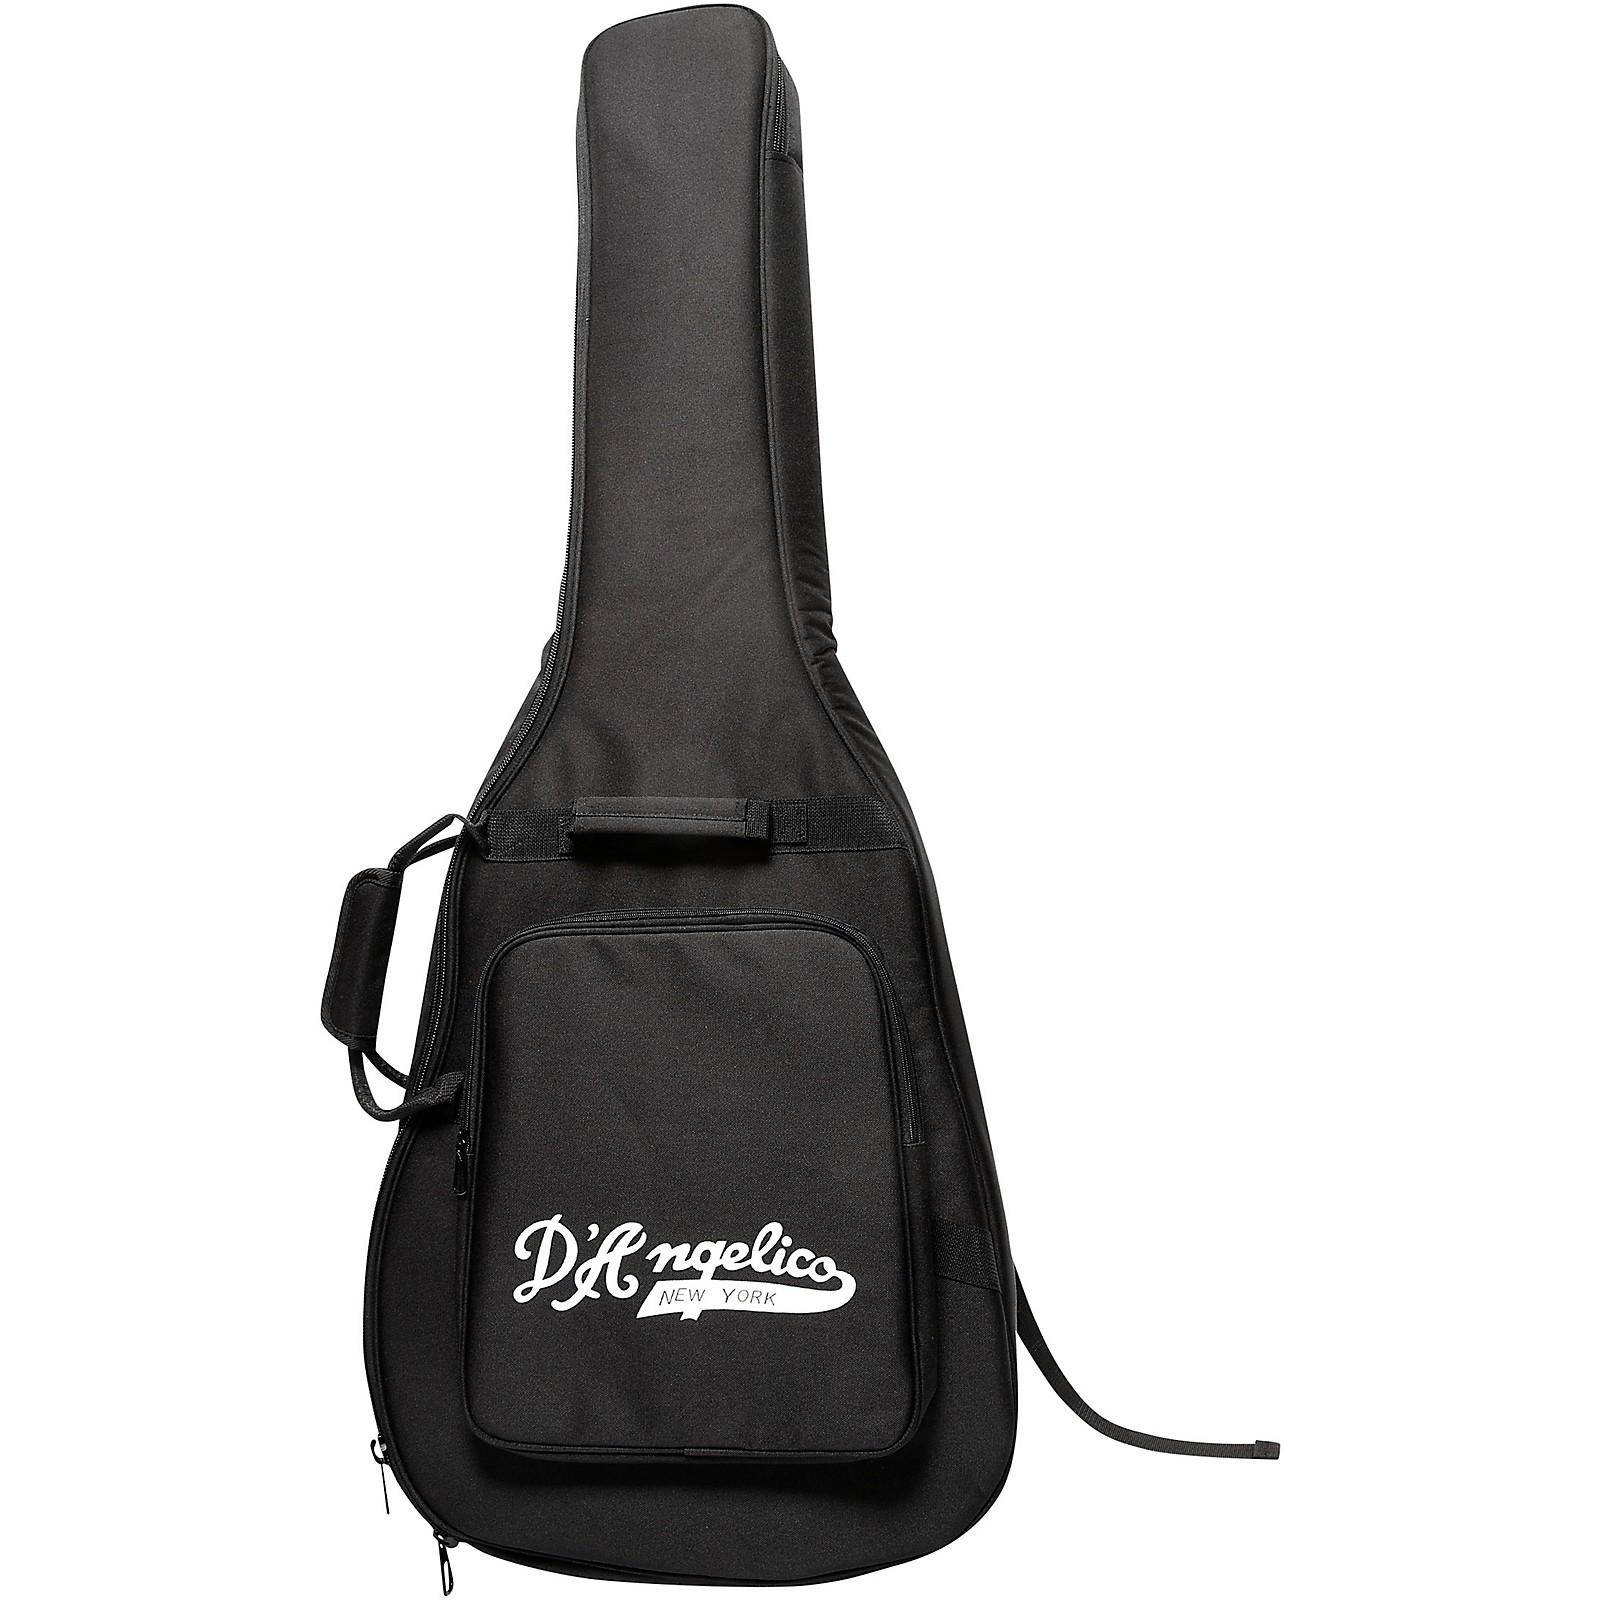 D'Angelico DC & SS Semi-Hollowbody Electric Guitar Gig Bag